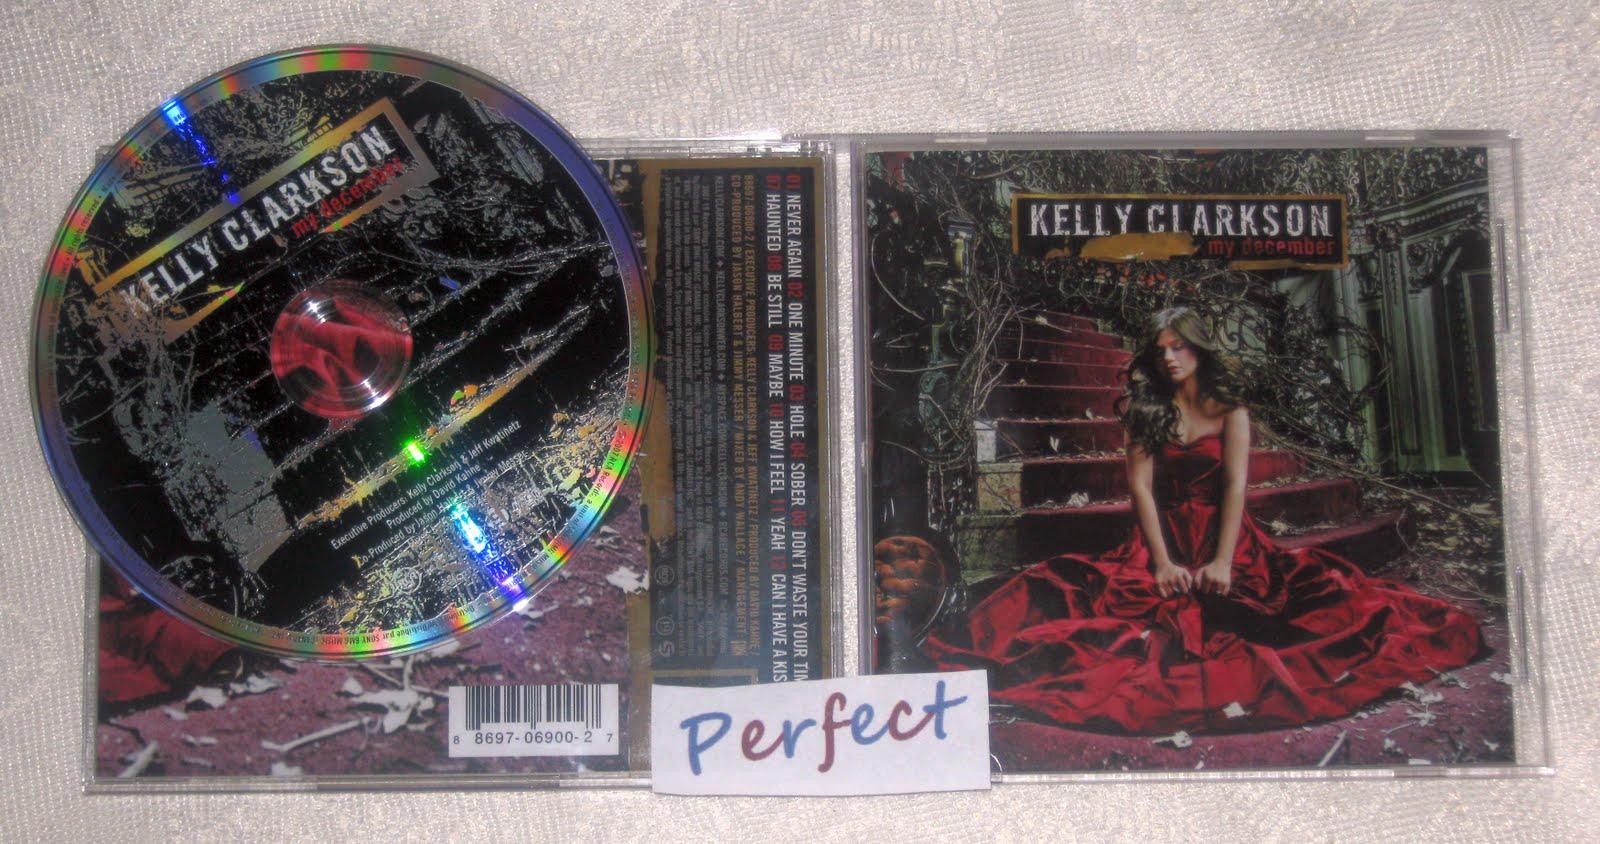 http://1.bp.blogspot.com/-PCu_h6r5Kuo/TqZqpKXIUeI/AAAAAAAAXsU/G2ieqg4I92o/s1600/Kelly_Clarkson-My_December-CD-FLAC-2007-PERFECT.jpg